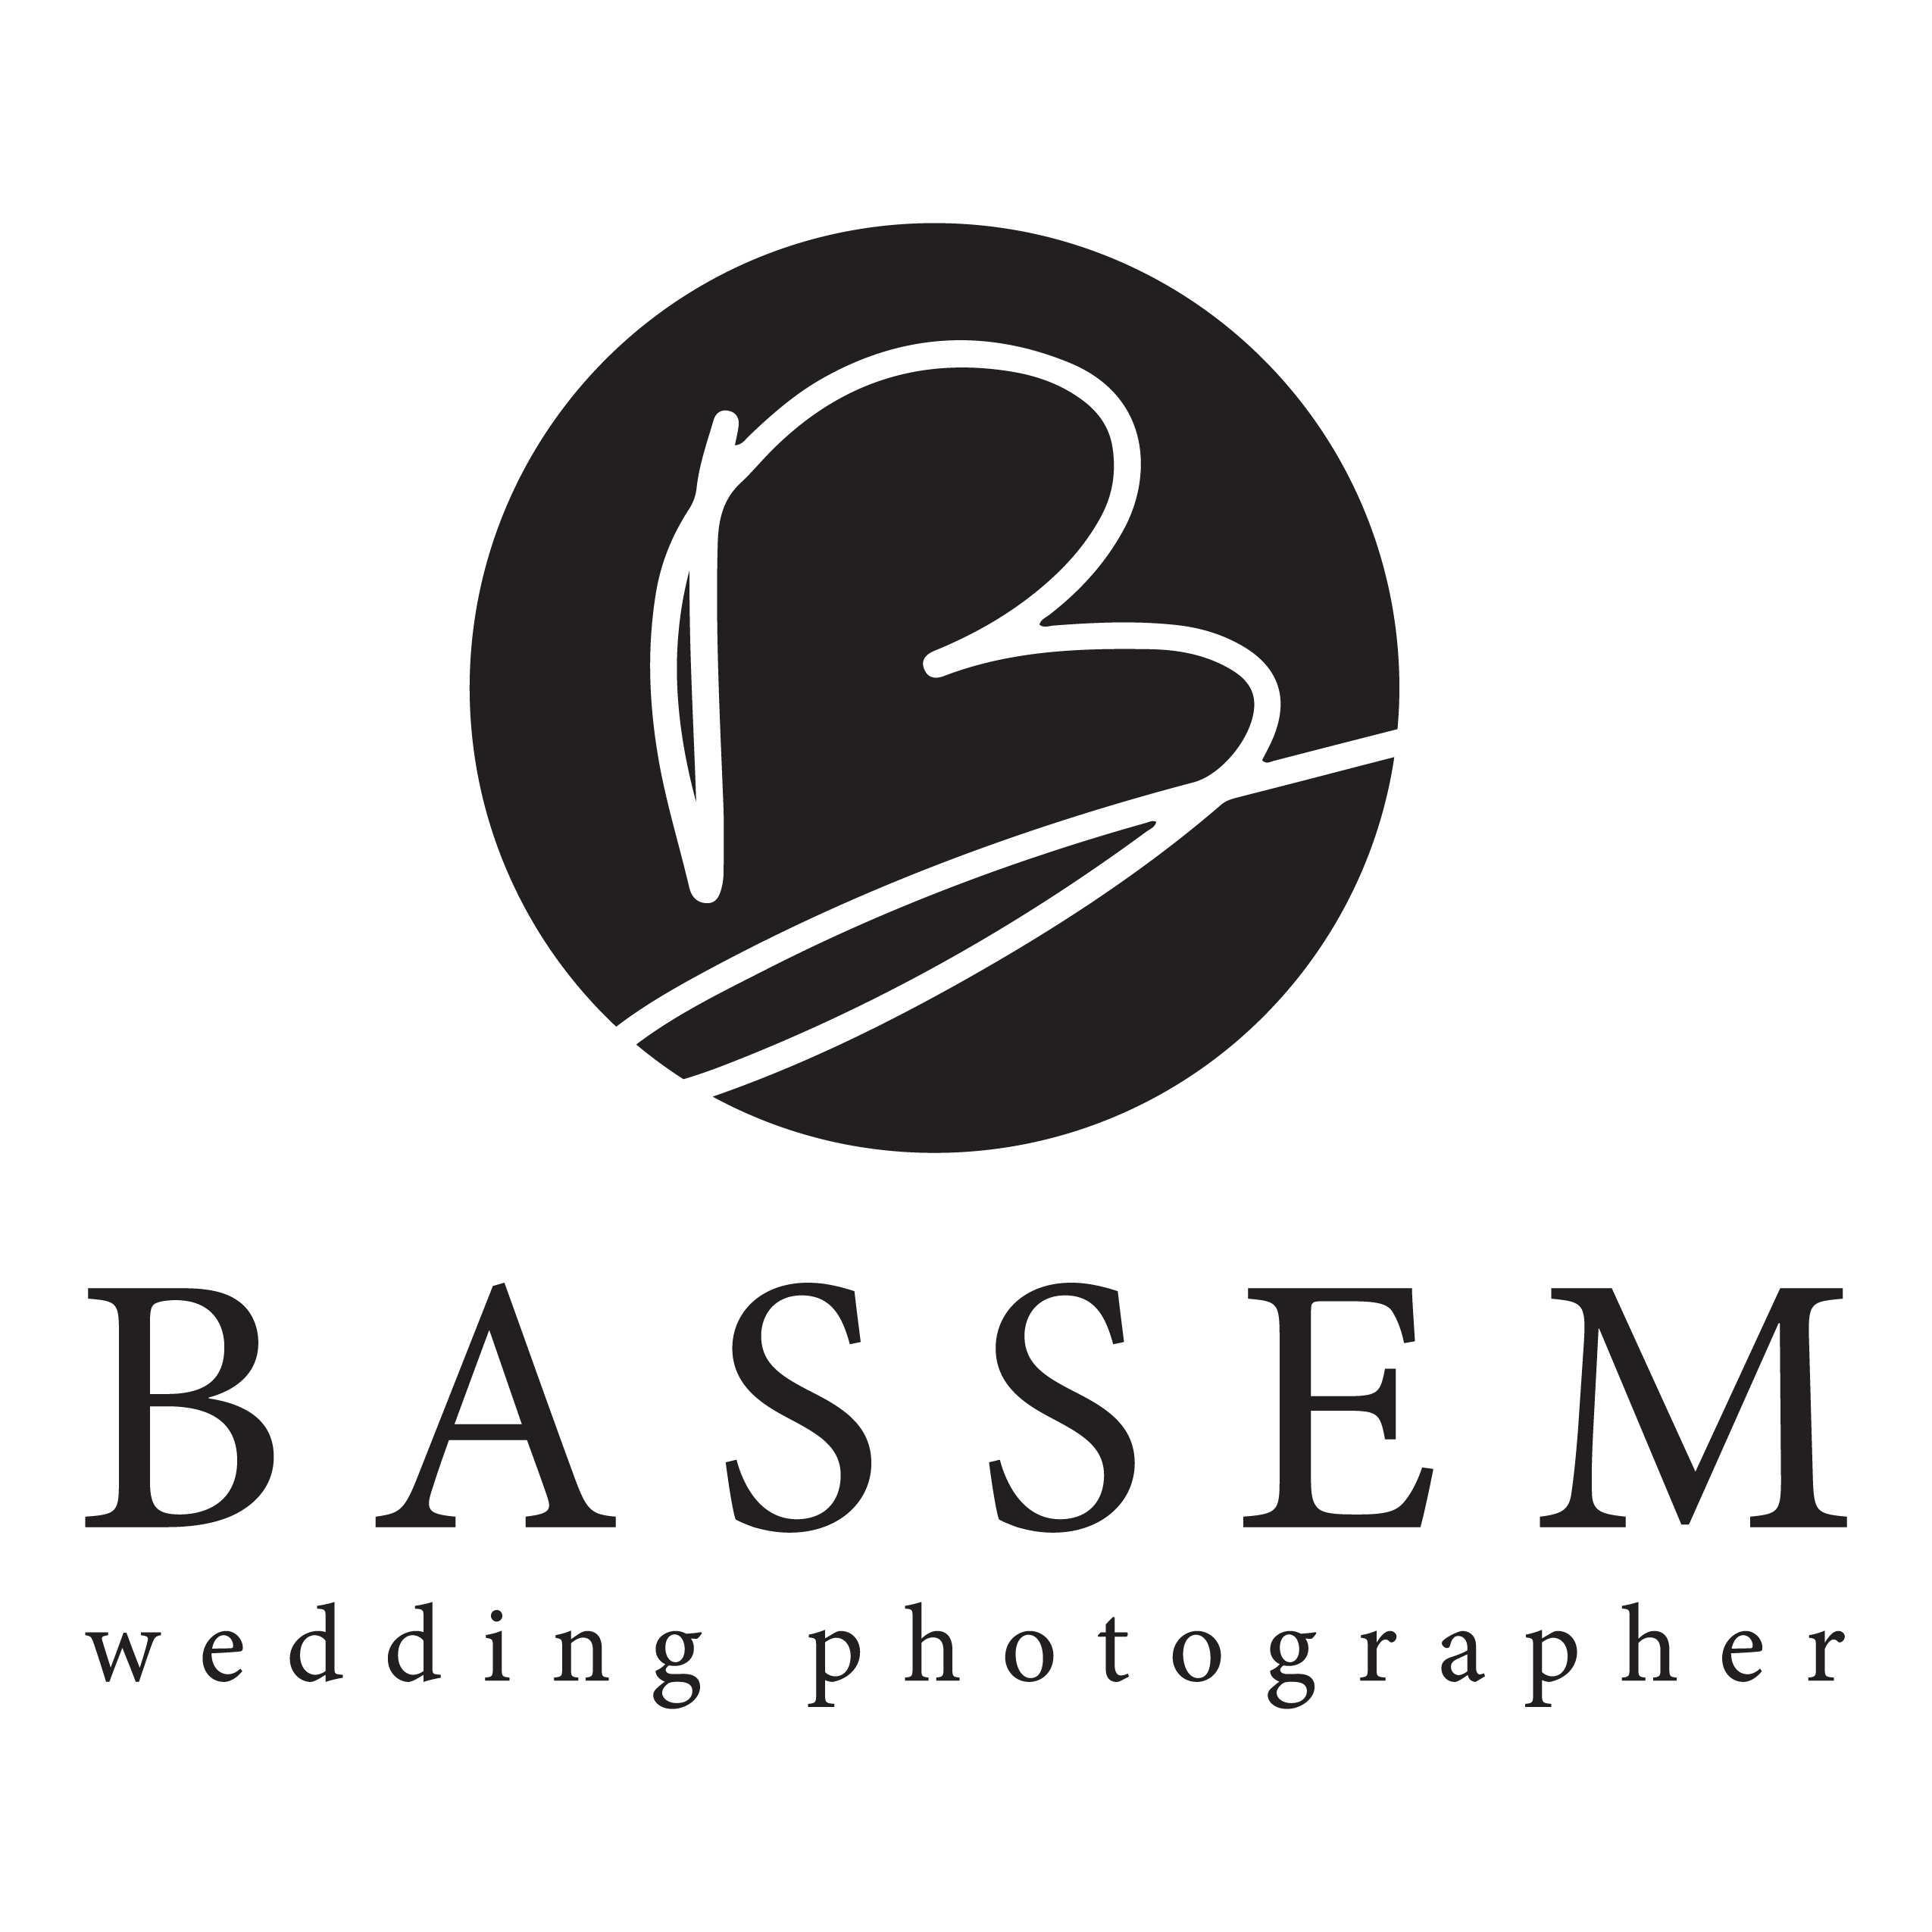 Toronto Wedding Photographer | Wedding Photography Kitchener Waterloo | Bassem.ca